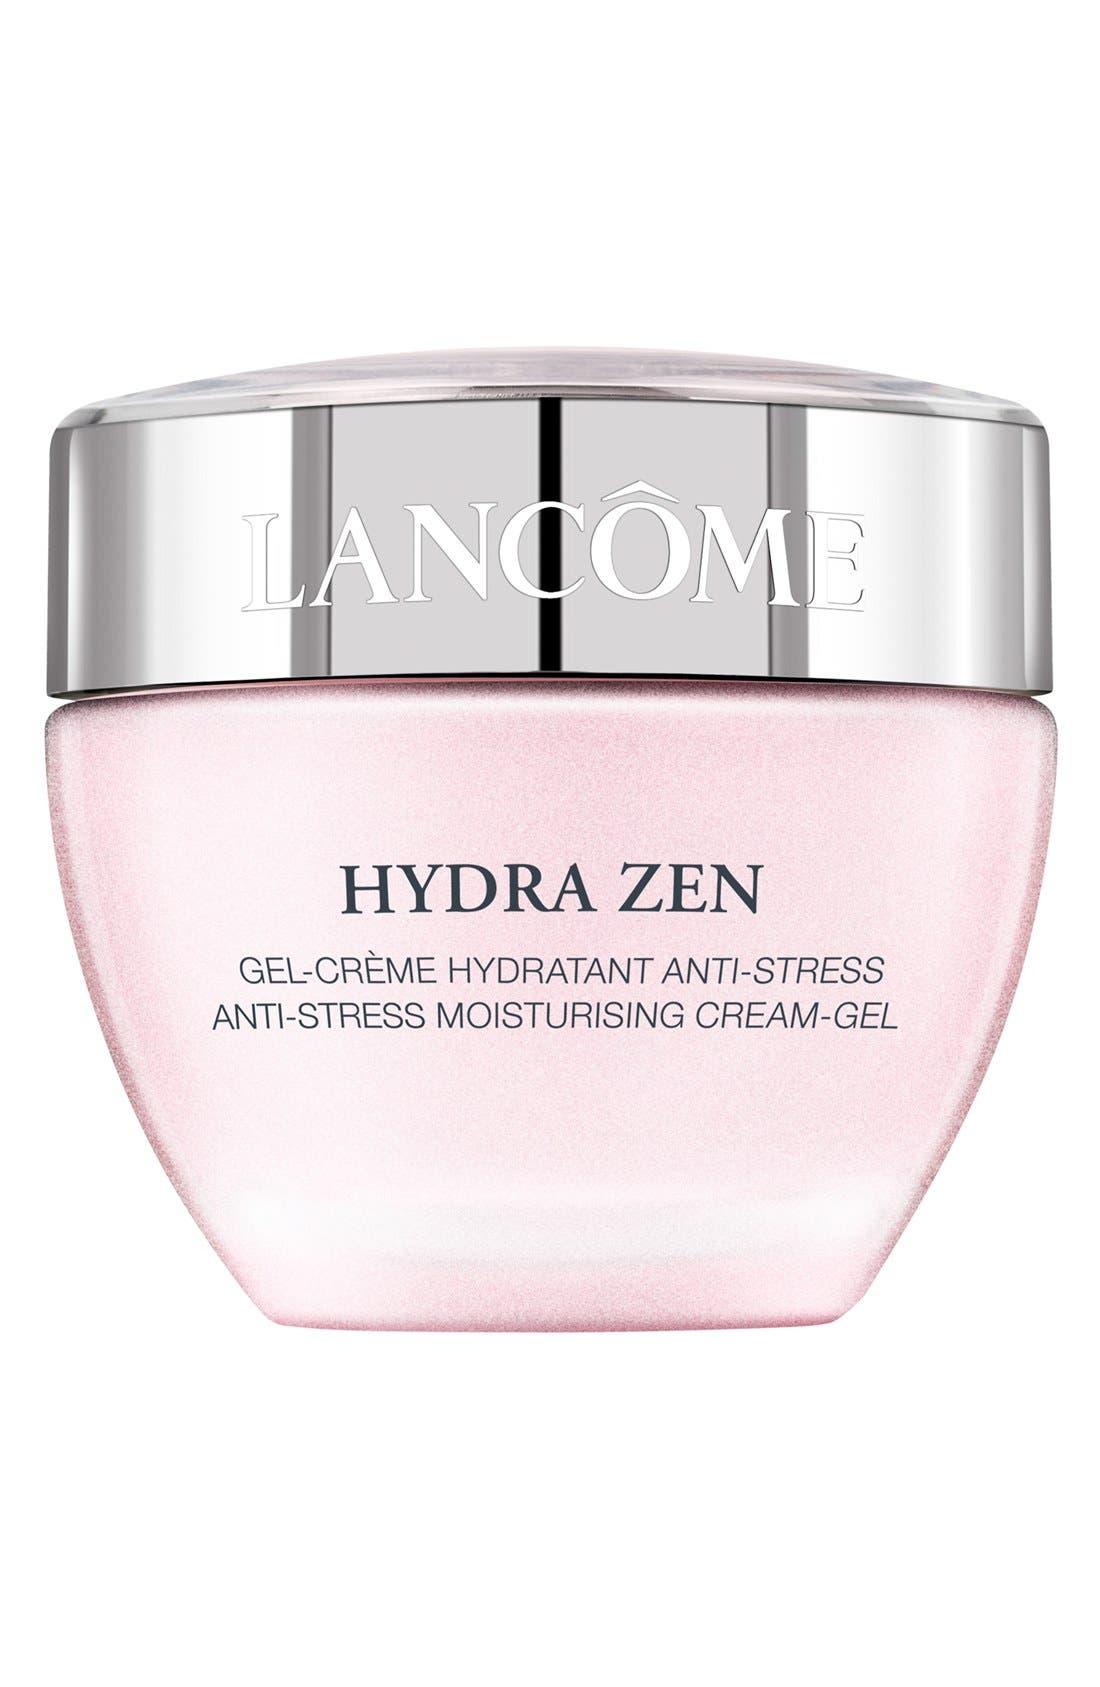 Lancome Hydra Zen Anti-Stress Moisturizing Cream-Gel Face Moisturizer